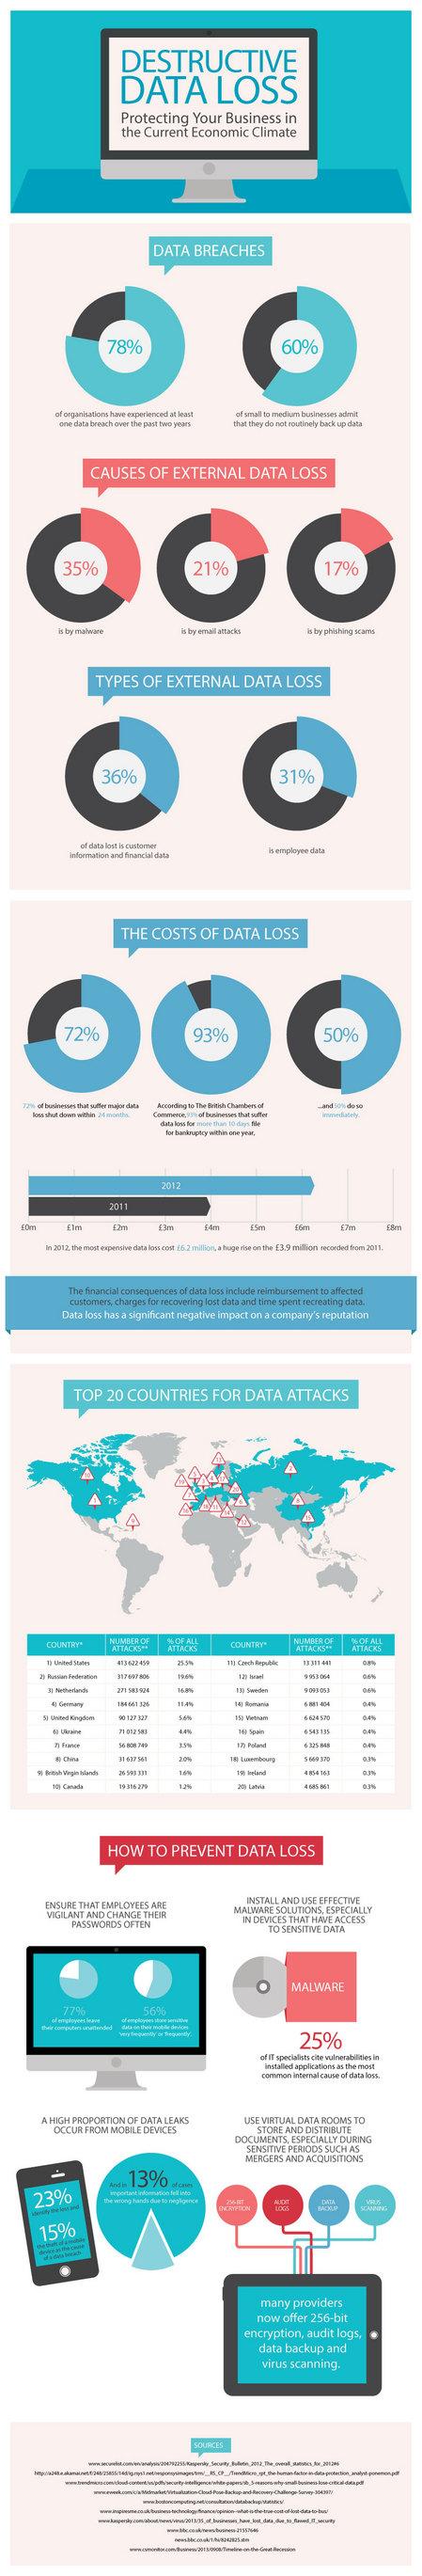 Data-Loss-Infographic.jpg